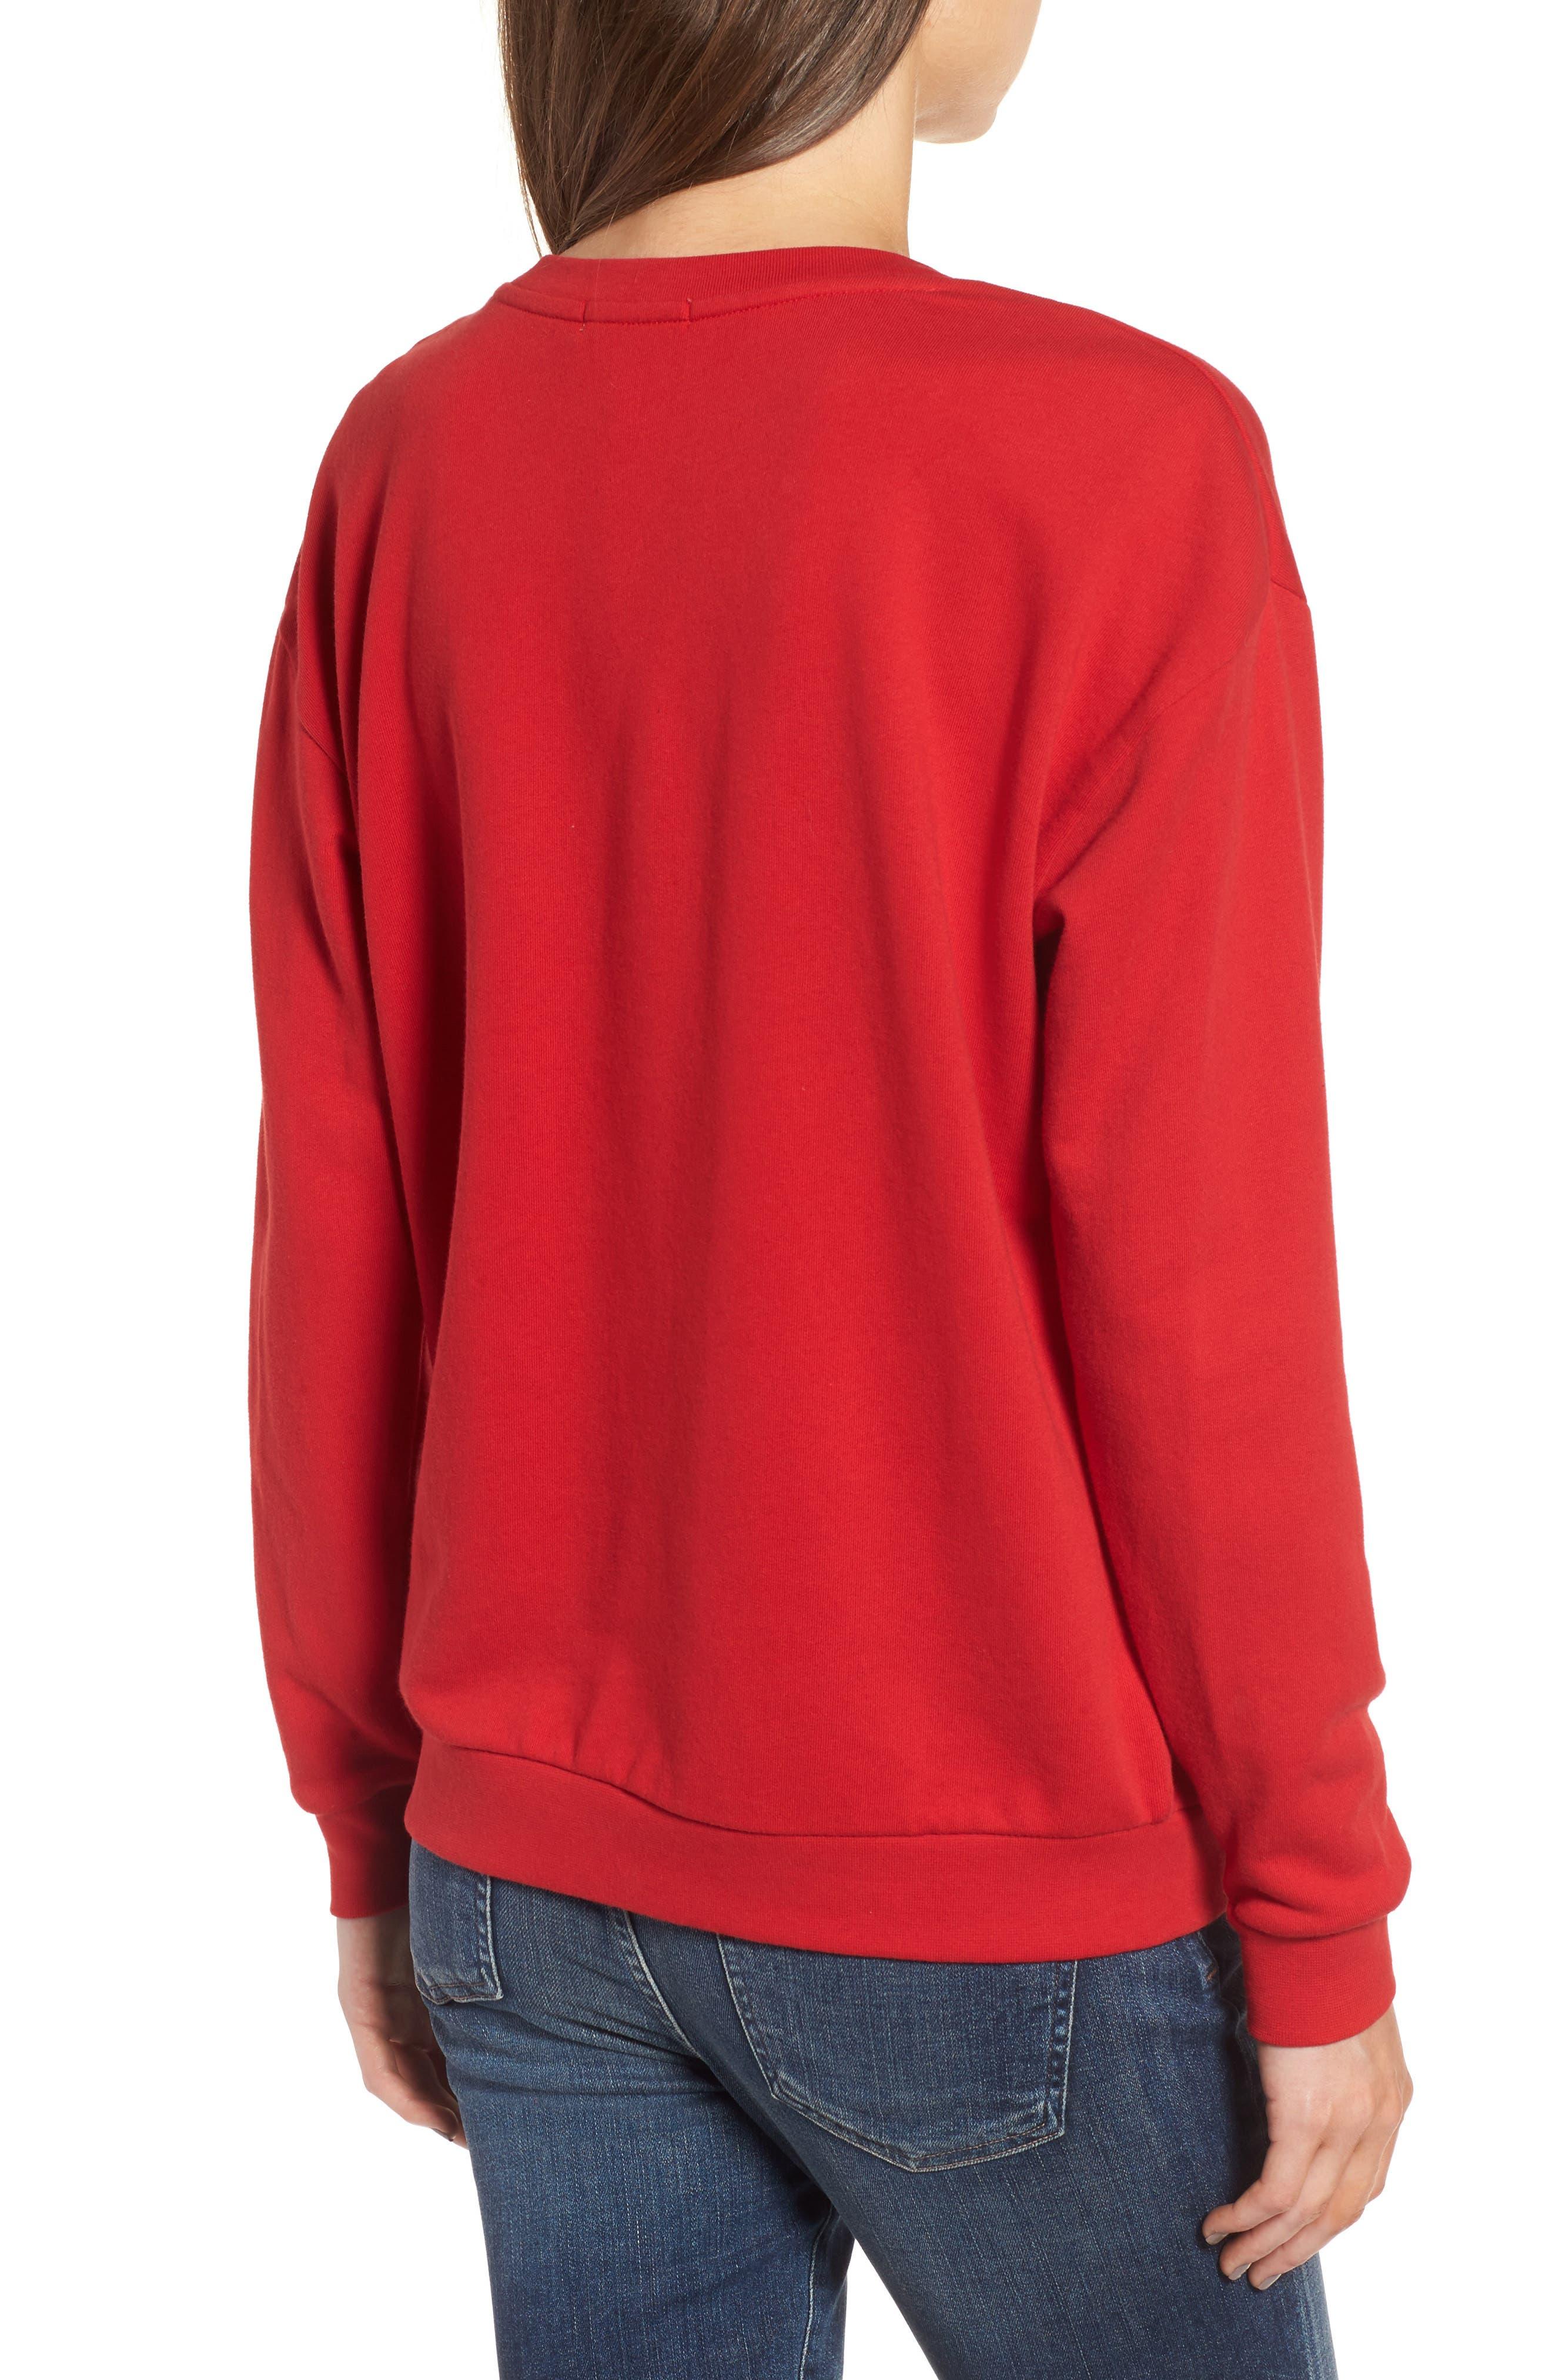 Let's Take an Elfie Sweatshirt,                             Alternate thumbnail 2, color,                             600